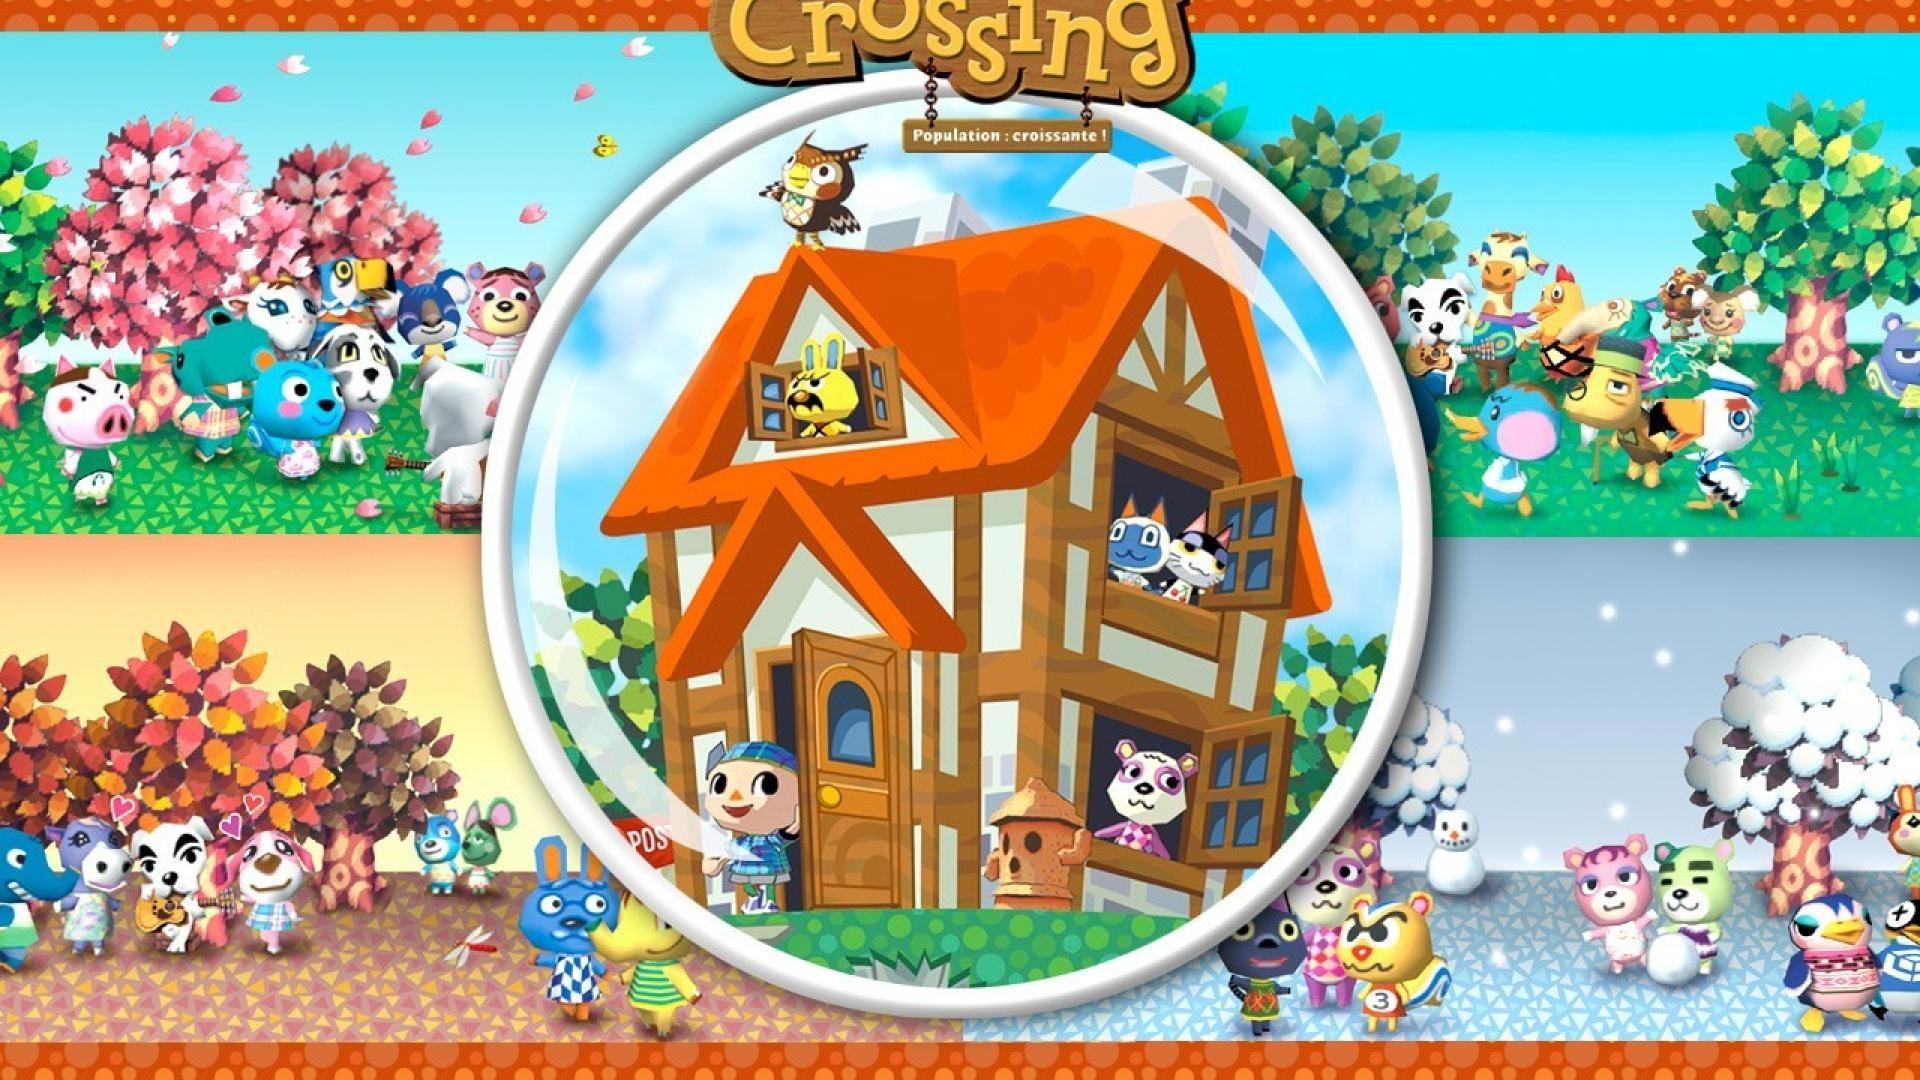 Nintendo gamecube animal crossing wallpaper | (35030)